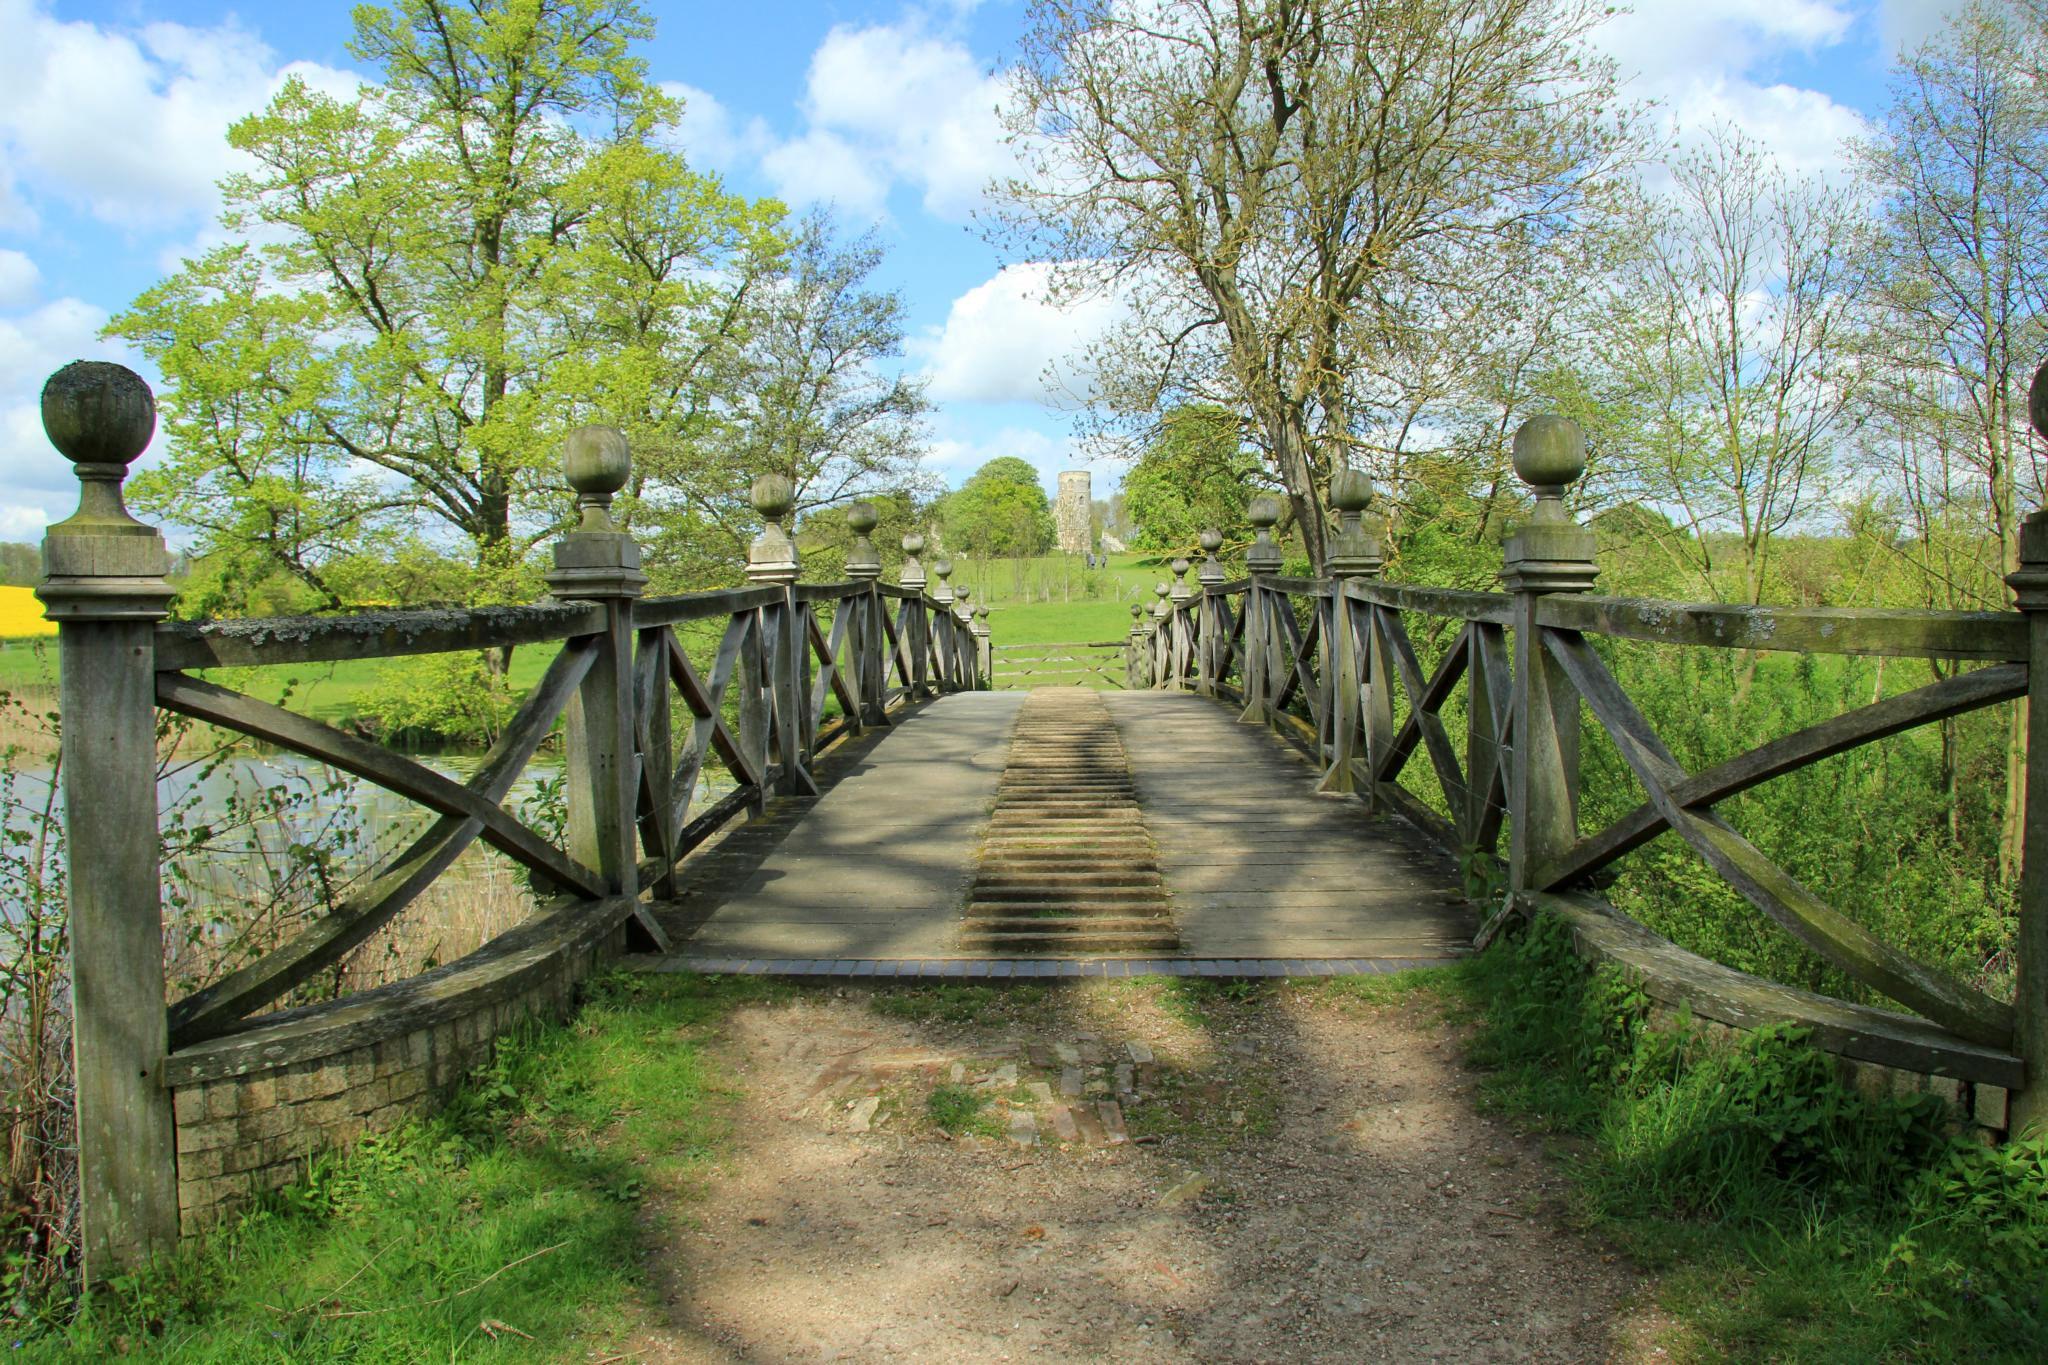 wood and stone bridge with trees and greenery around